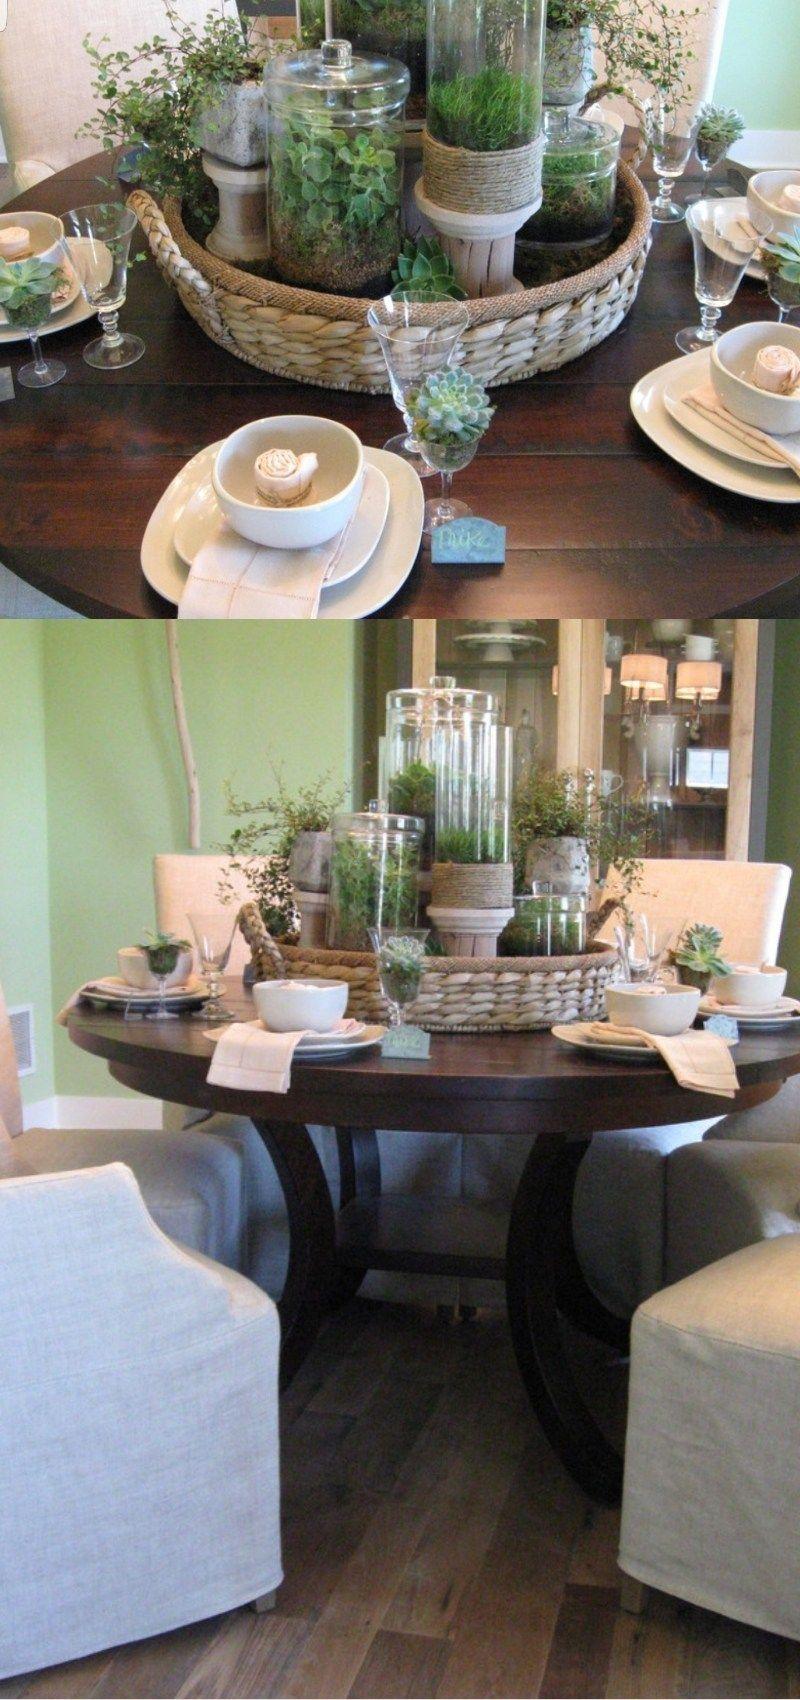 Simple Table Setting Ideas Dining Table Centerpiece Dining Table Decor Modern Round Dining Table Decor